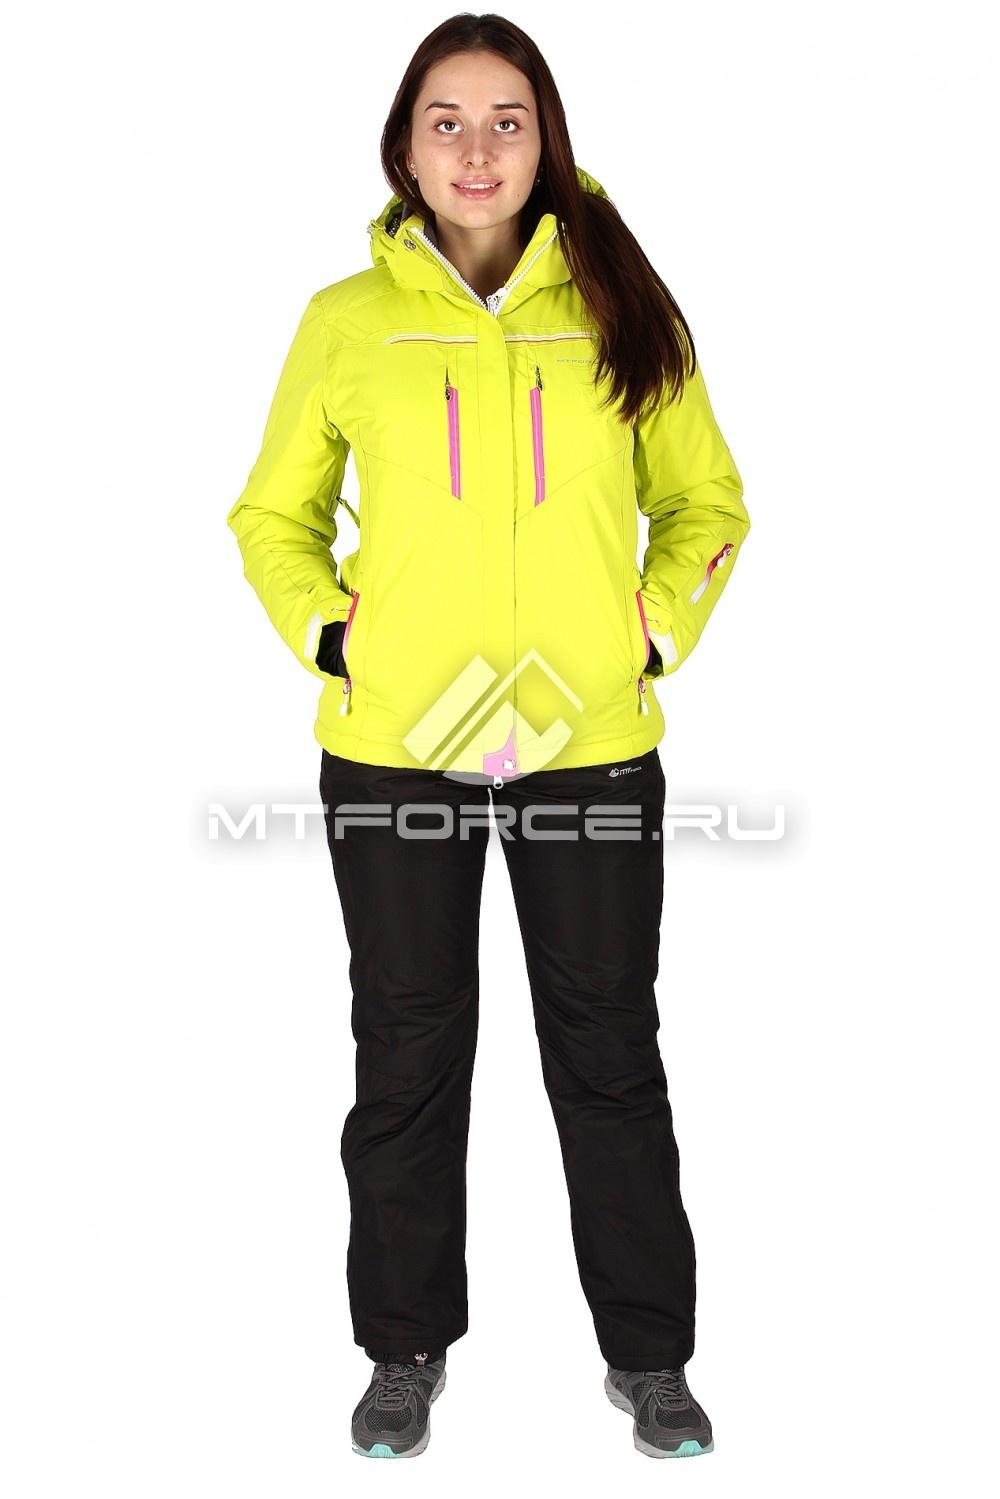 Желтый женский костюм купить